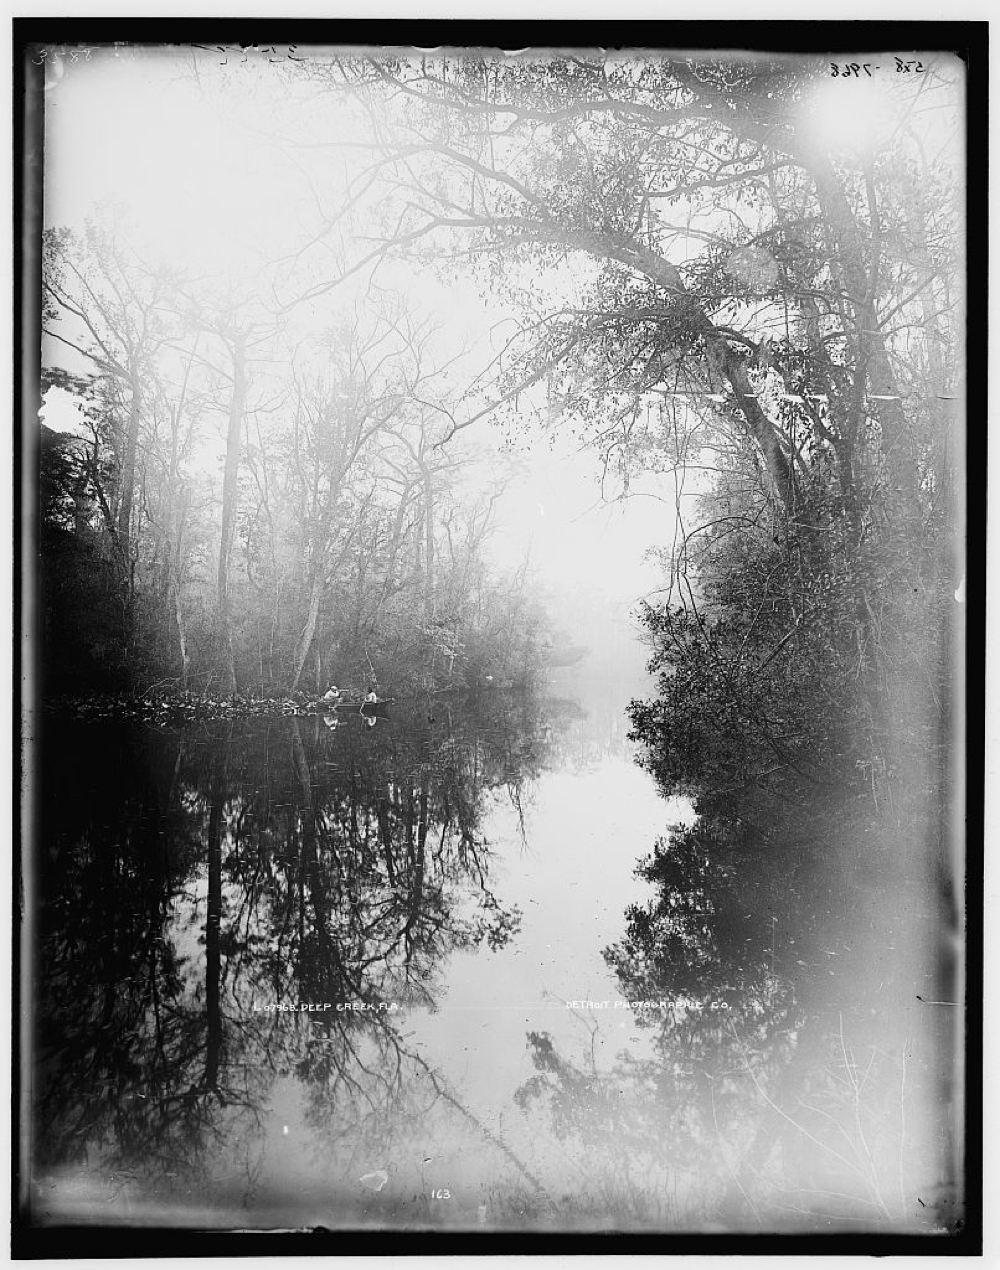 Deep Creek, Fla